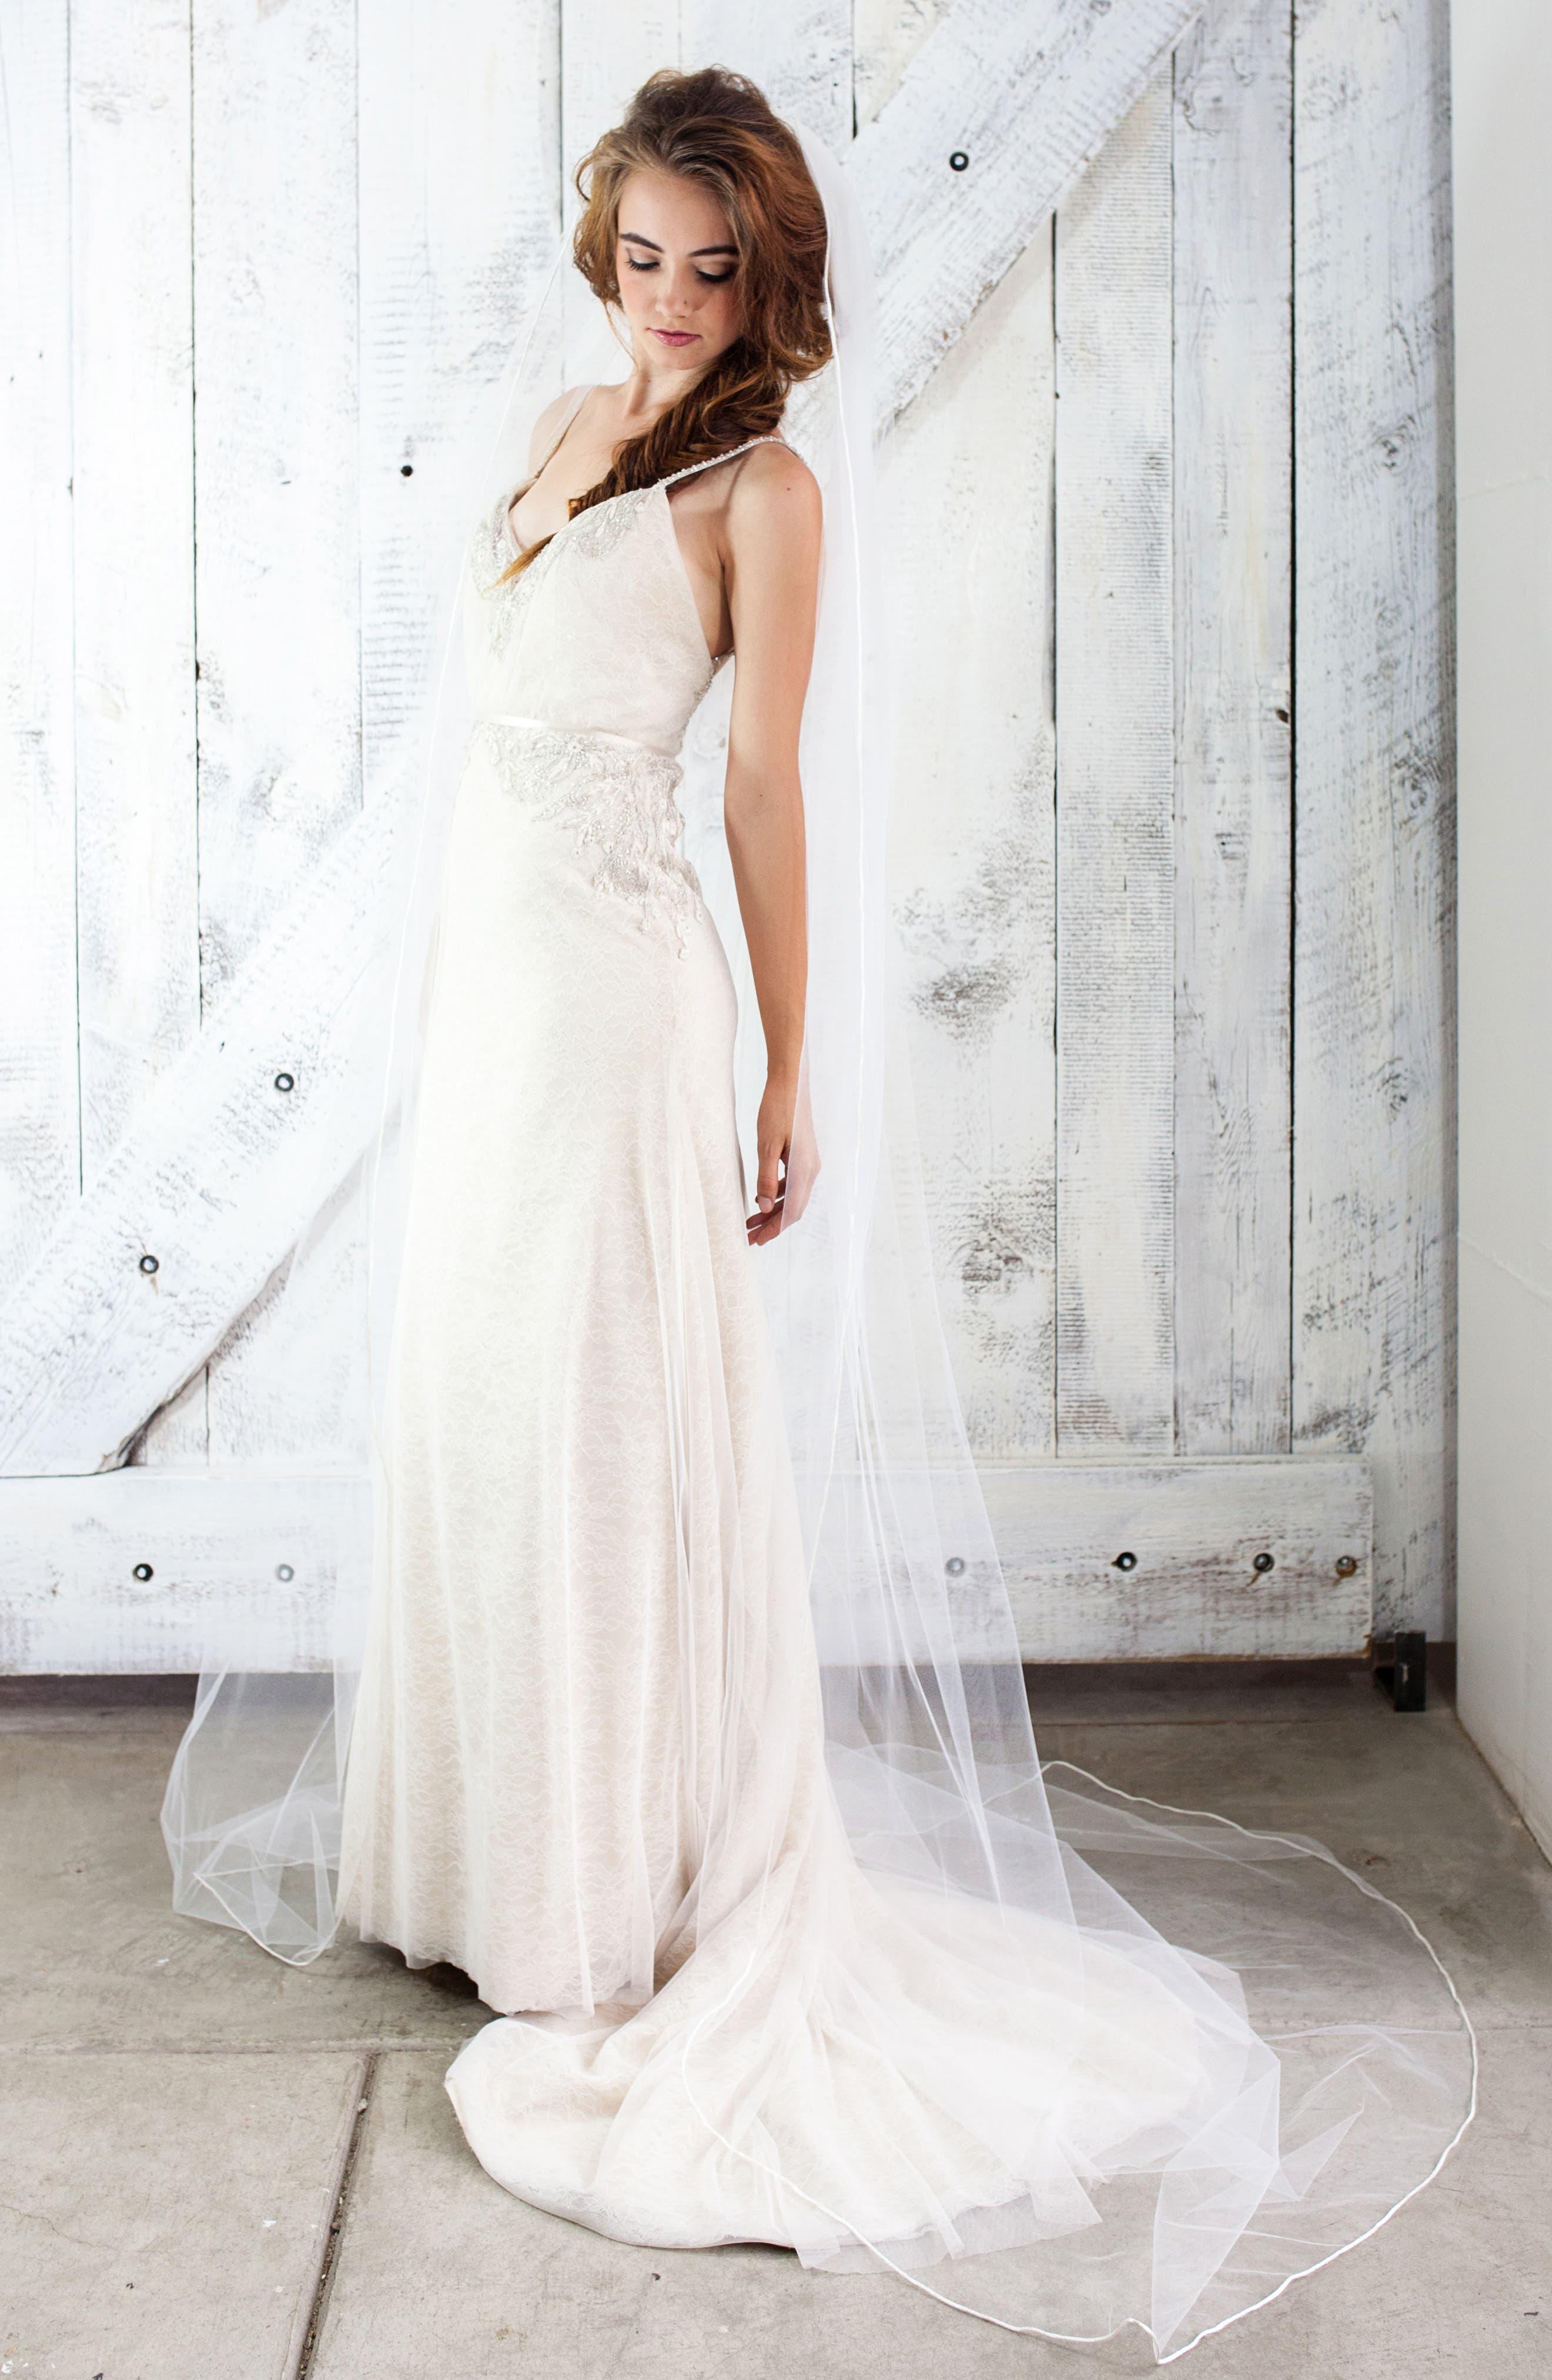 Kauai Mesh Bridal Veil,                             Main thumbnail 1, color,                             900